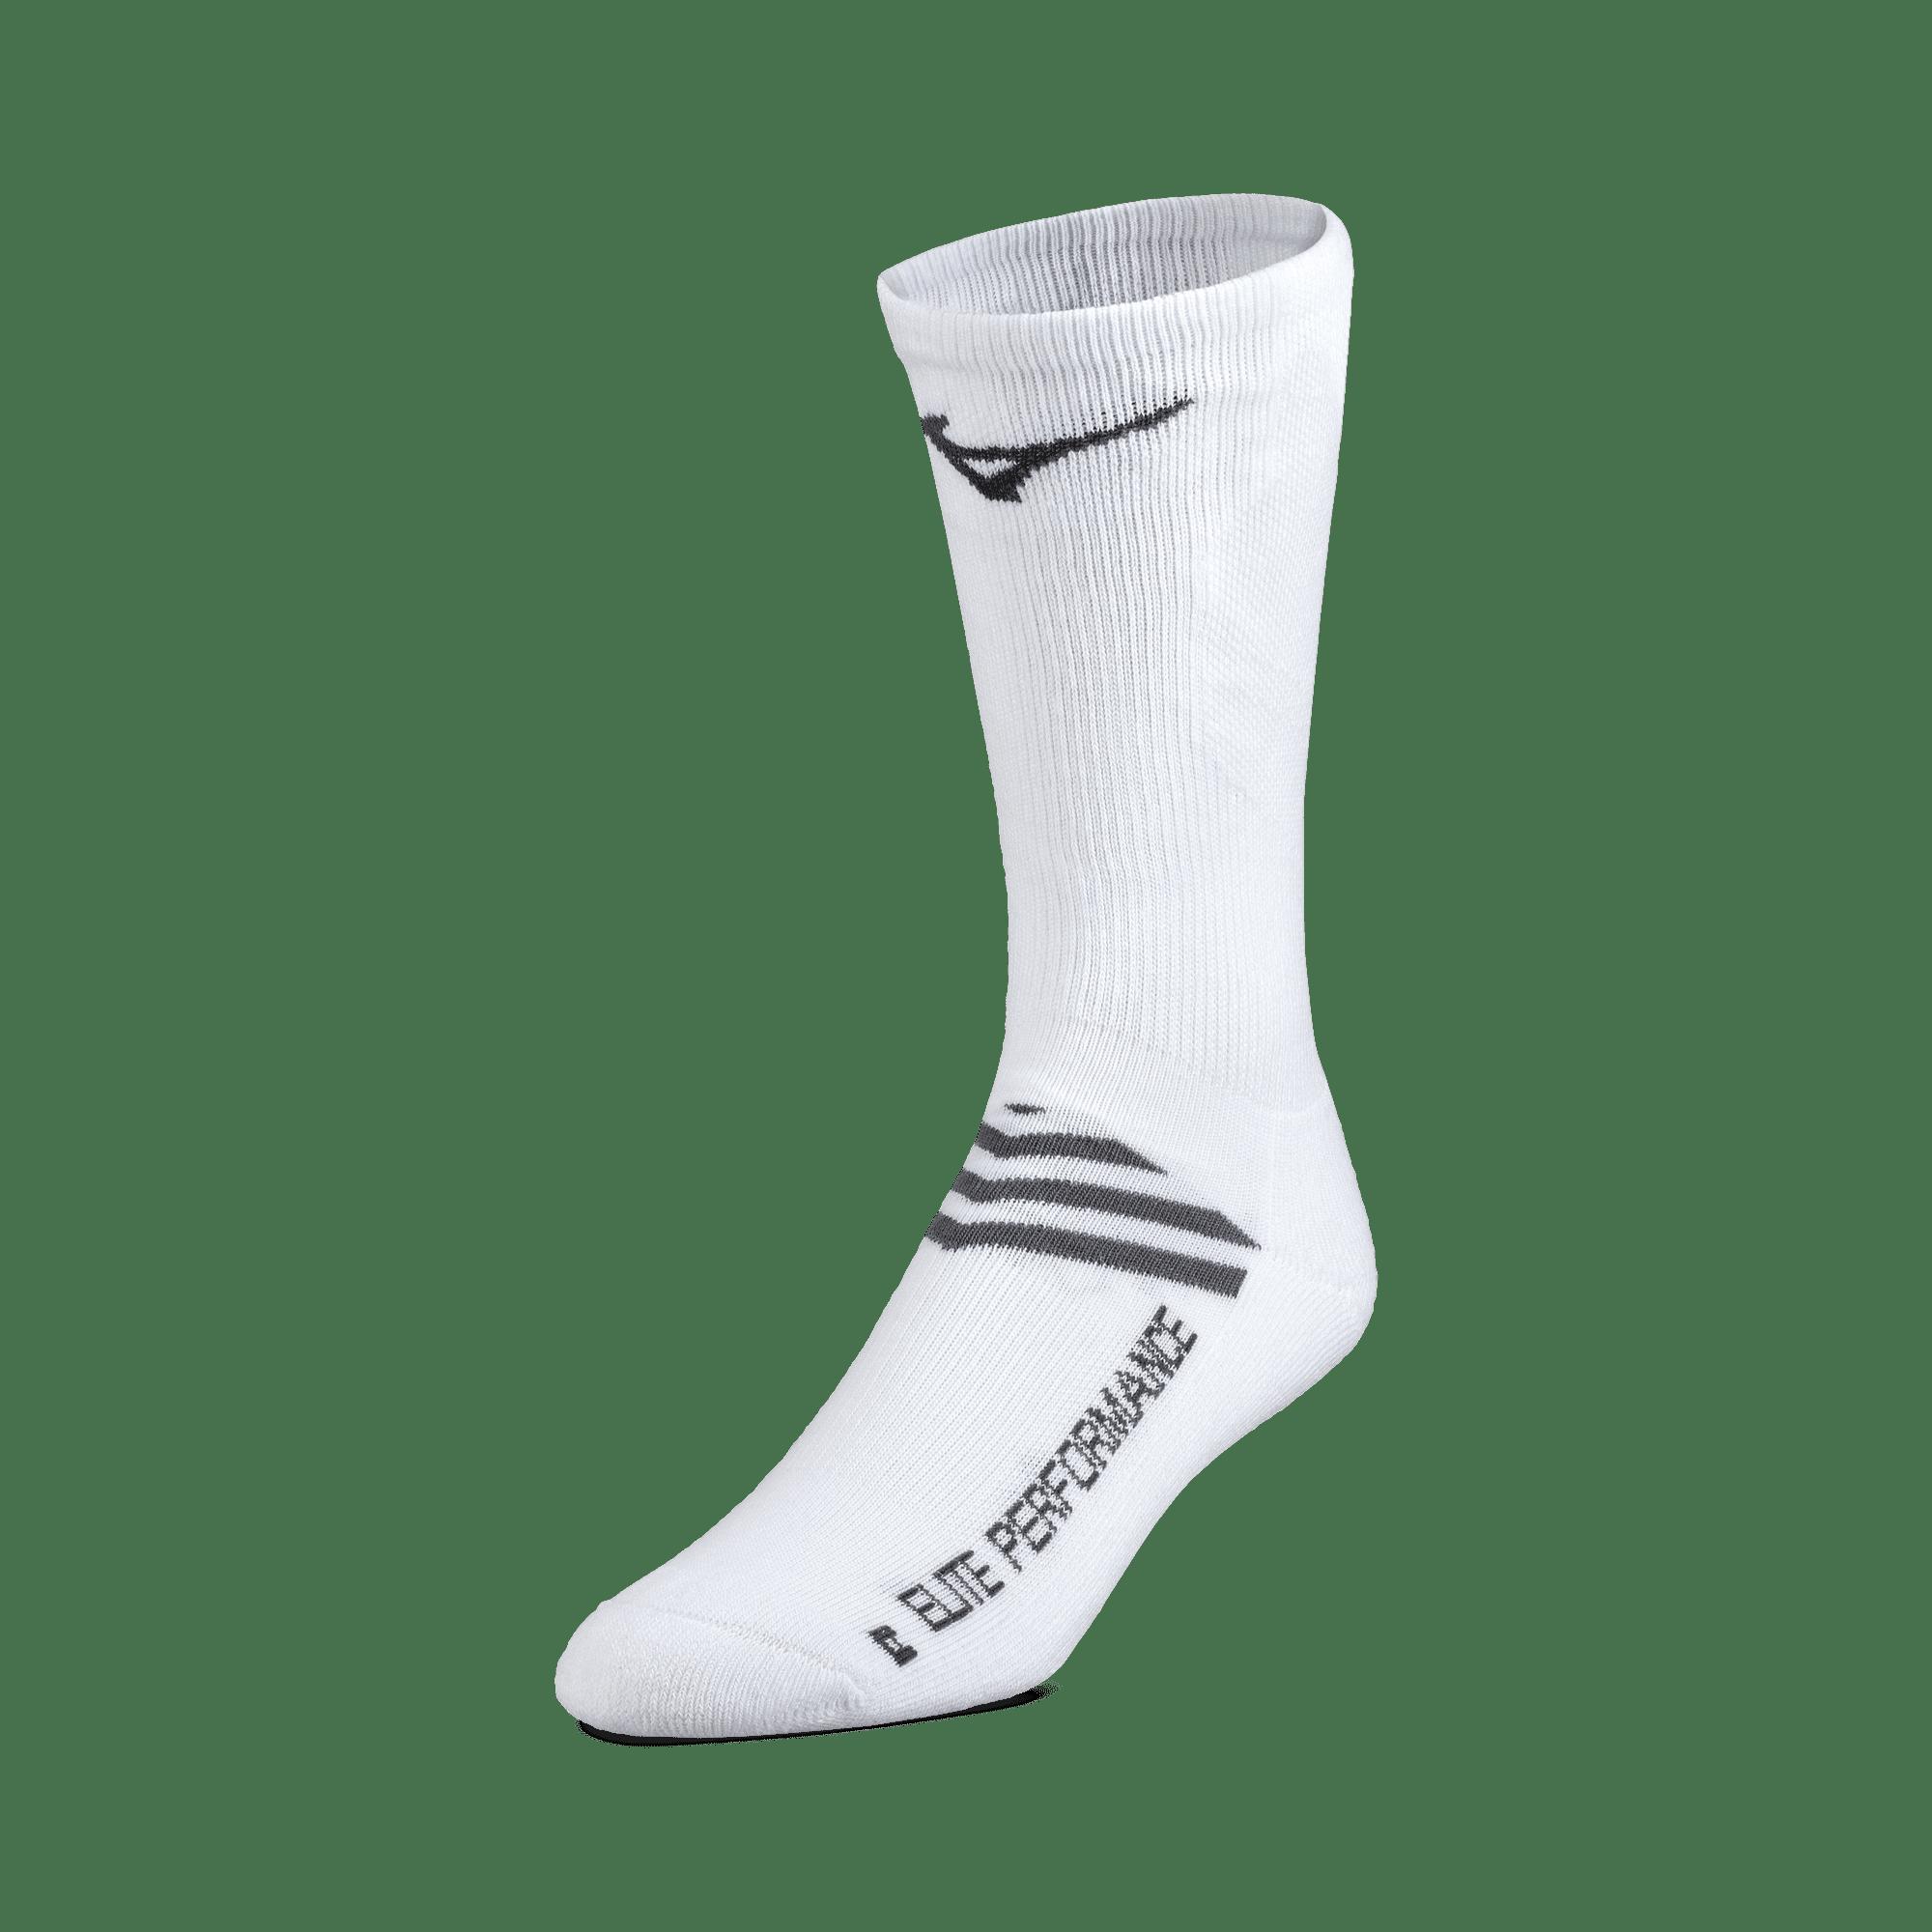 mizuno performance plus volleyball crew socks